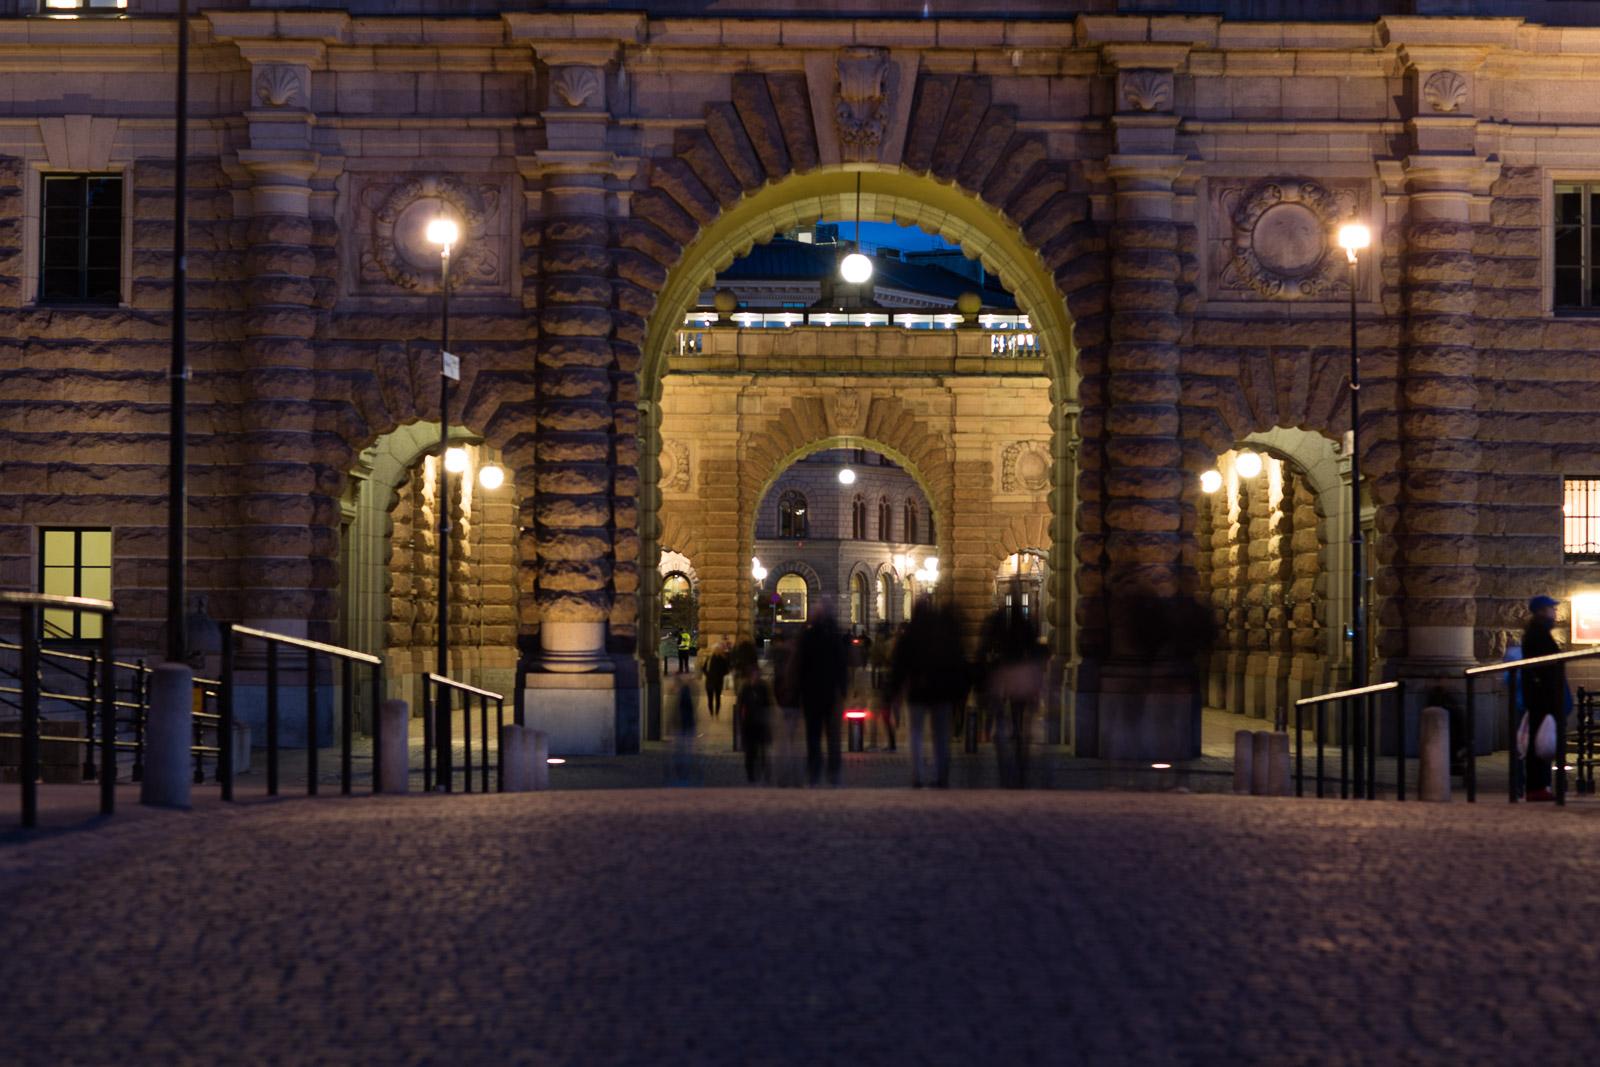 161002-stockholm-468.jpg